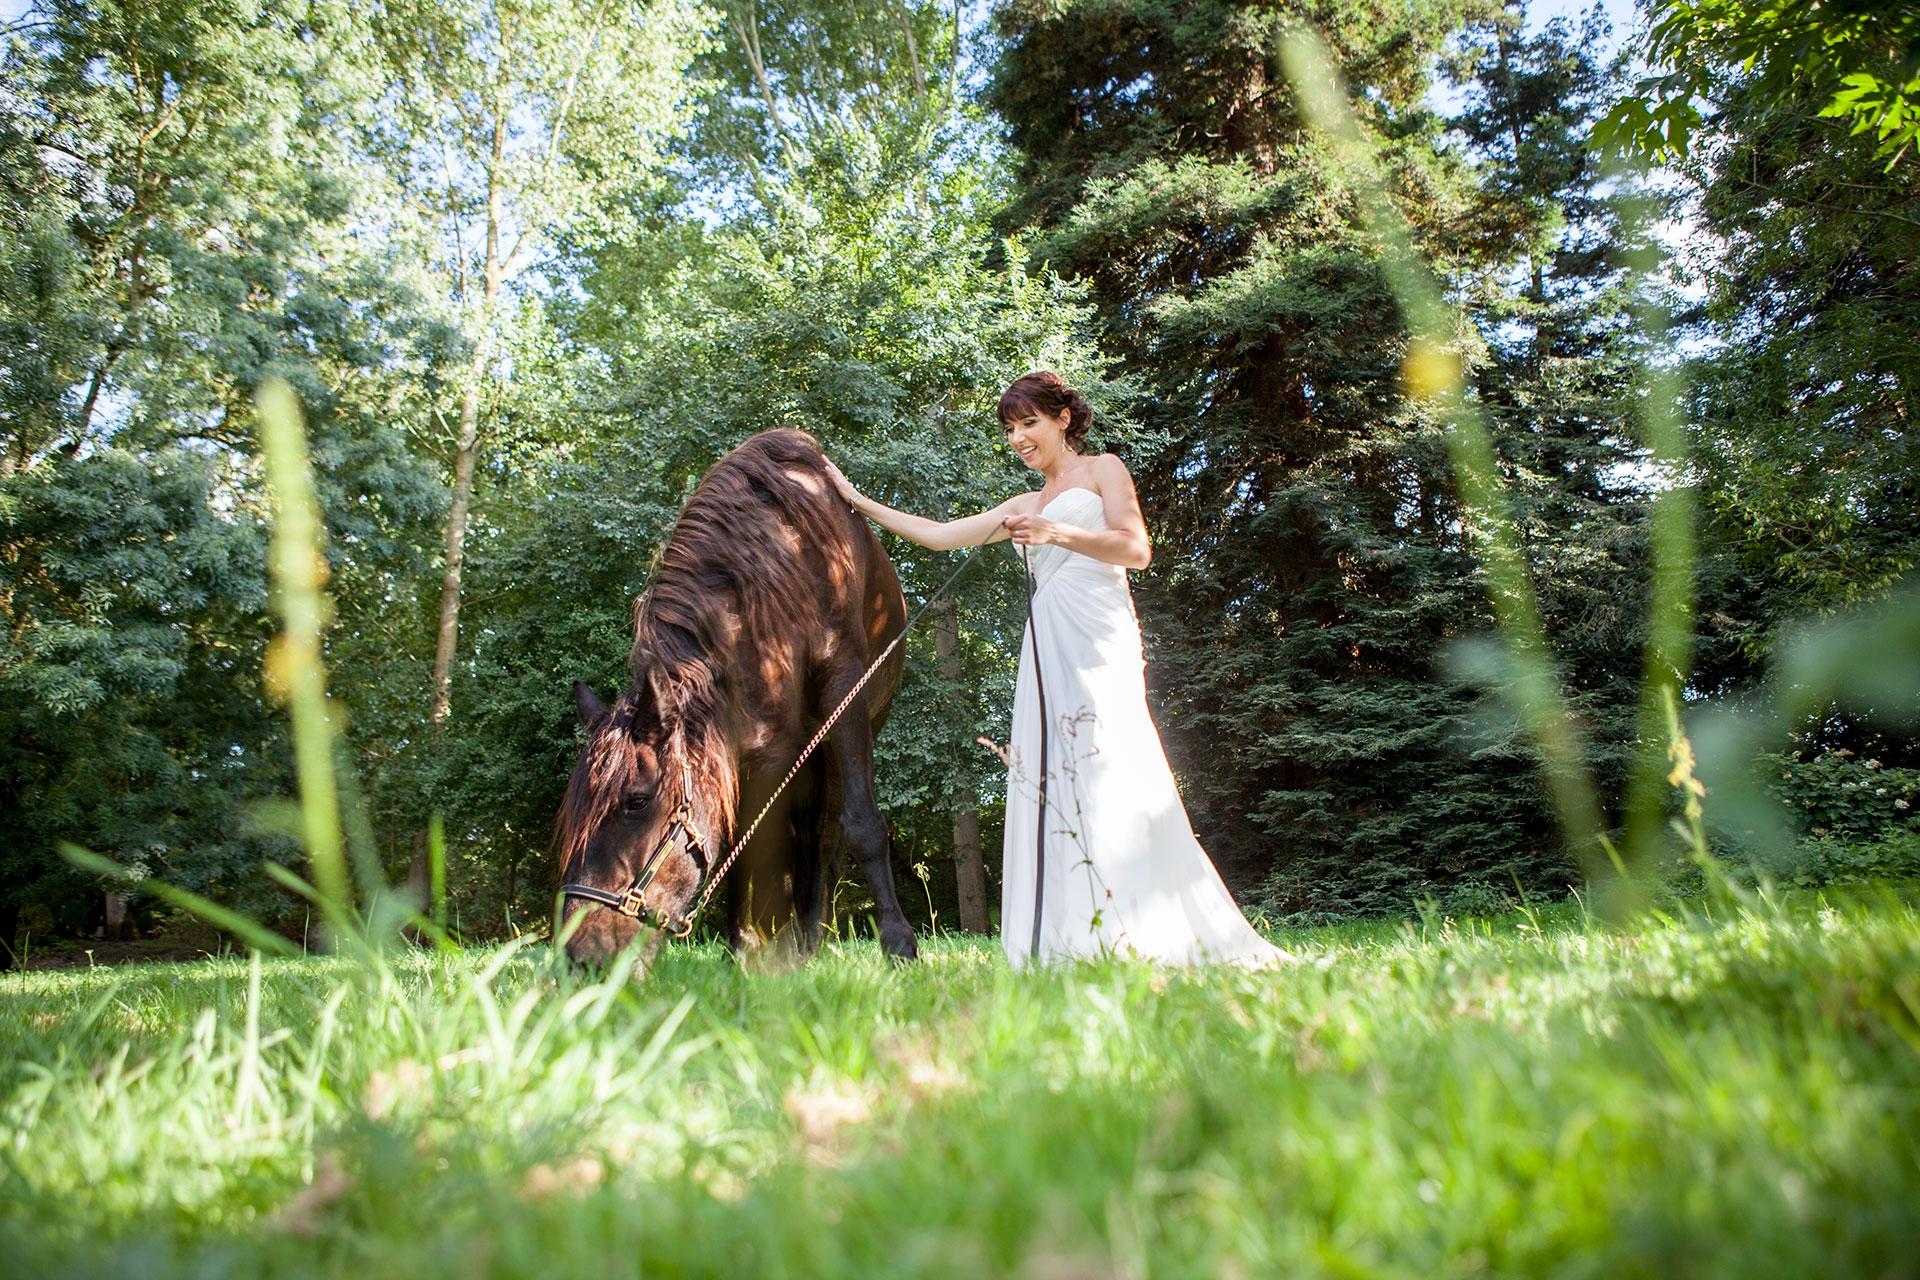 particuliers-evenements-mariages-oui-aurelie&geoffrey-35